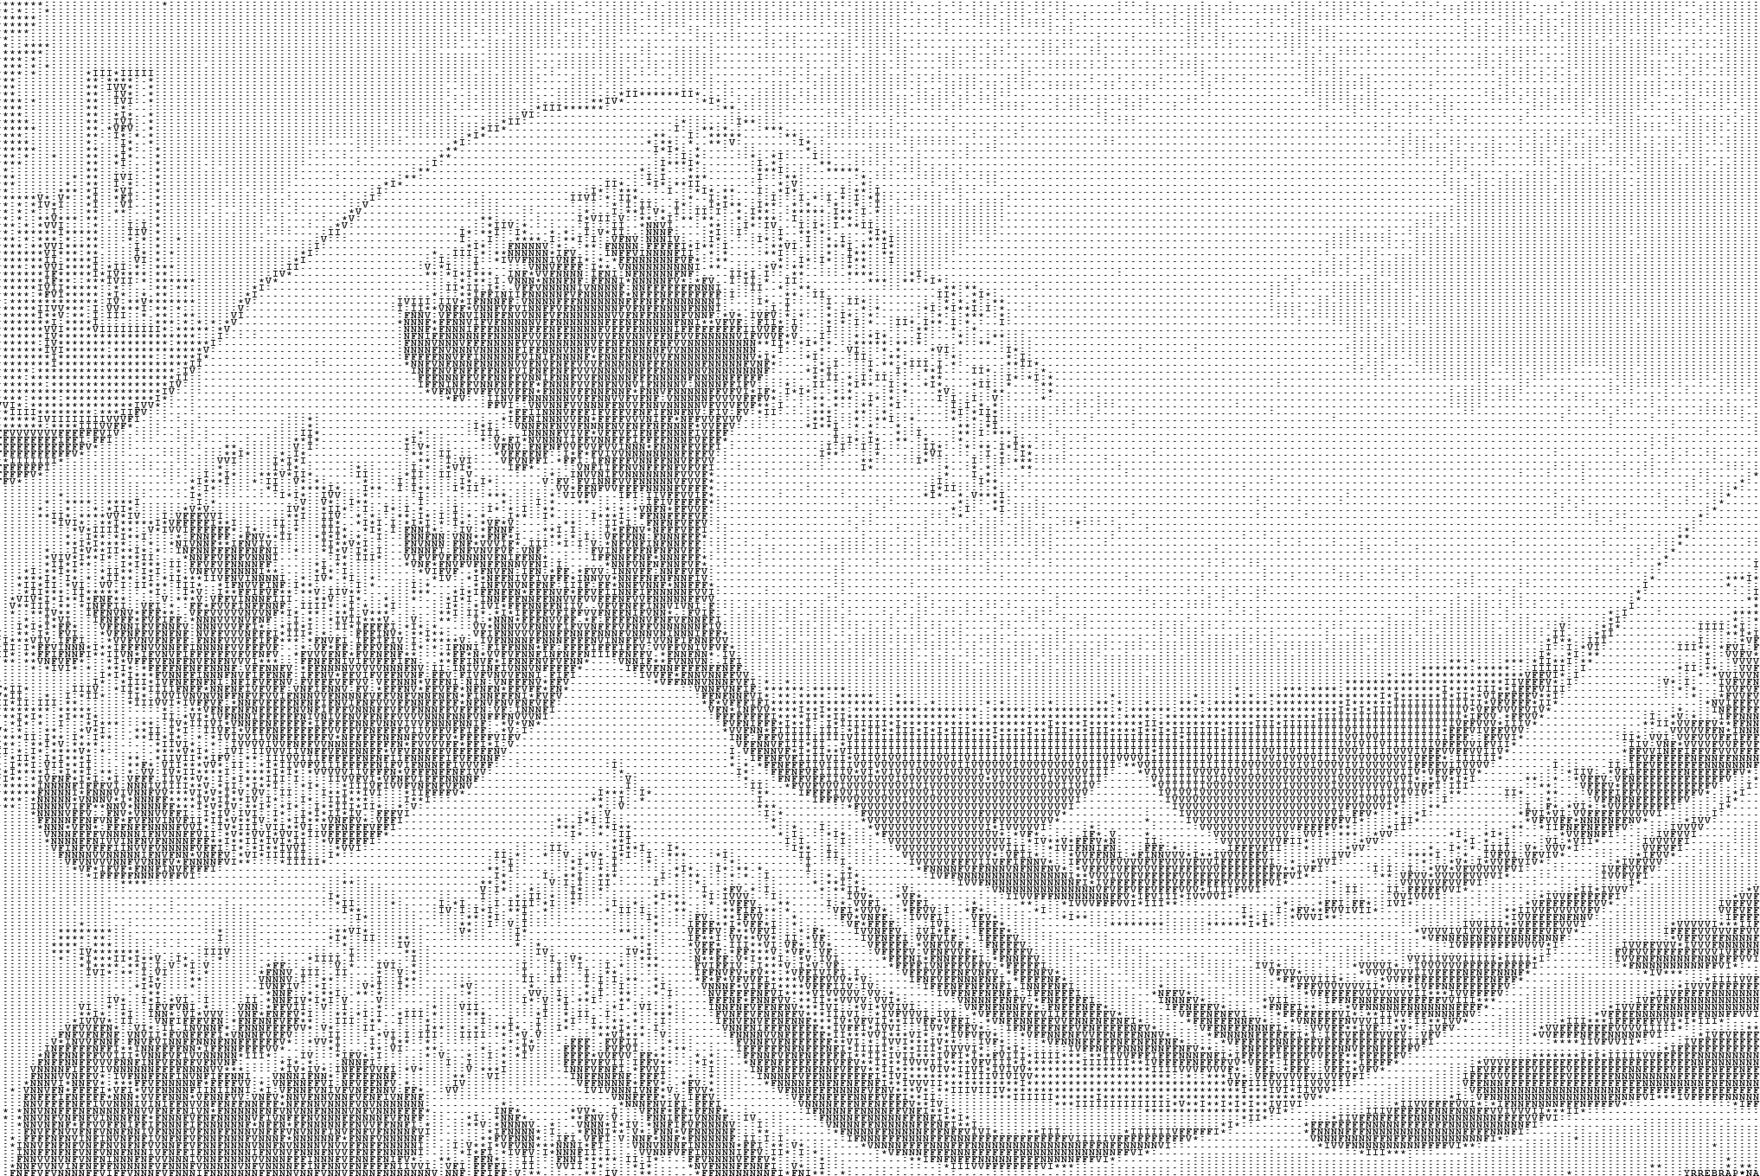 ASCII-ukiyowaves2048-gray